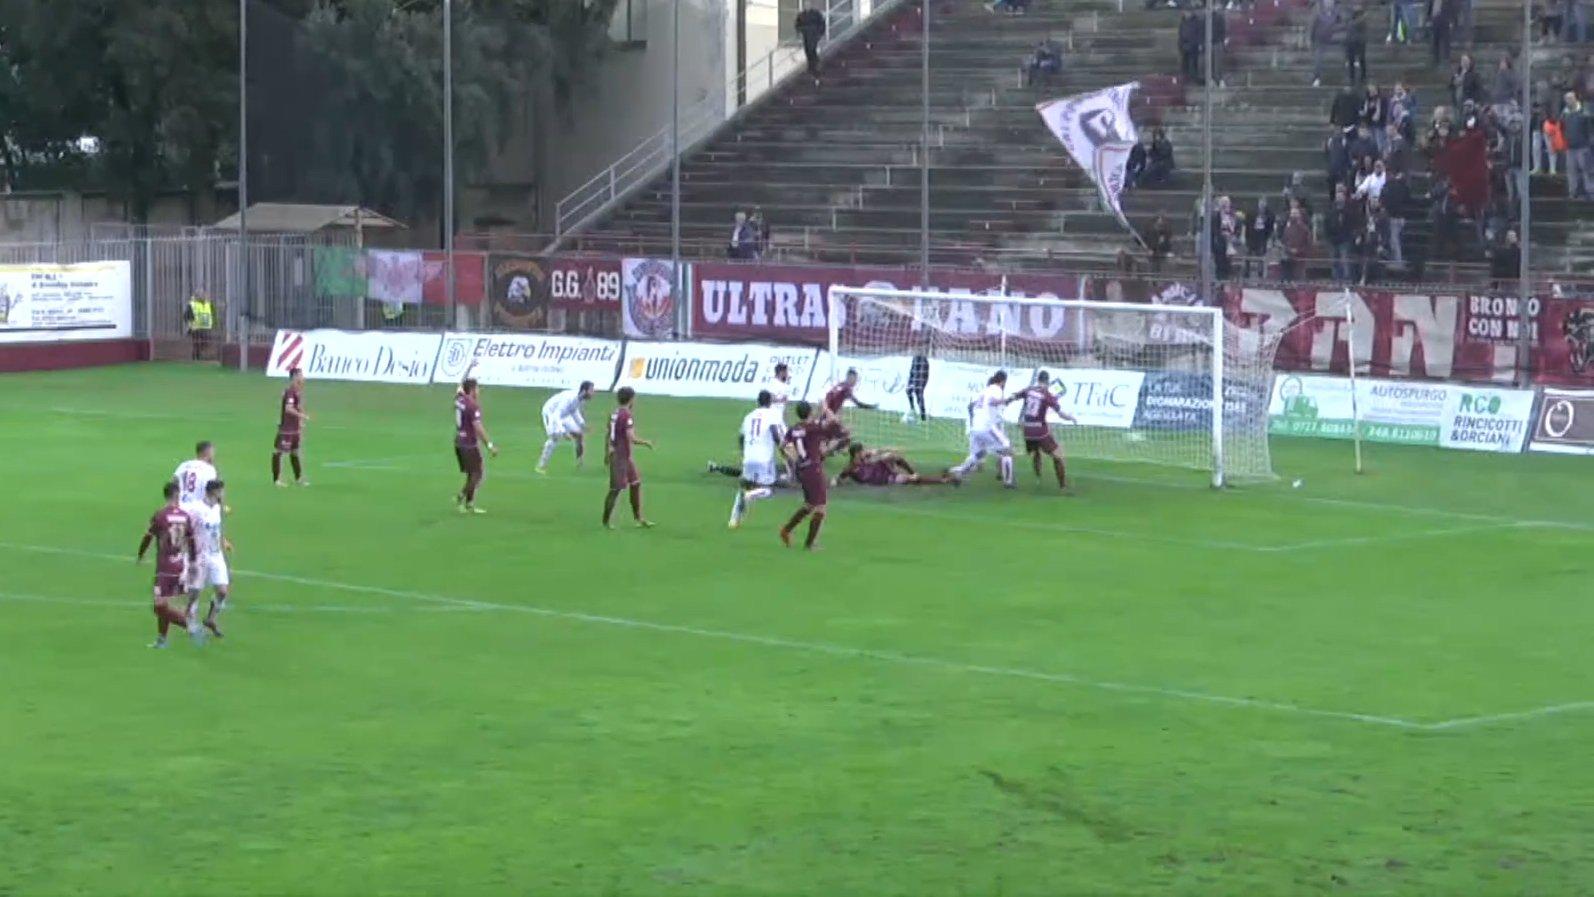 Fano - Piacenza 2-4 - San Marino Rtv